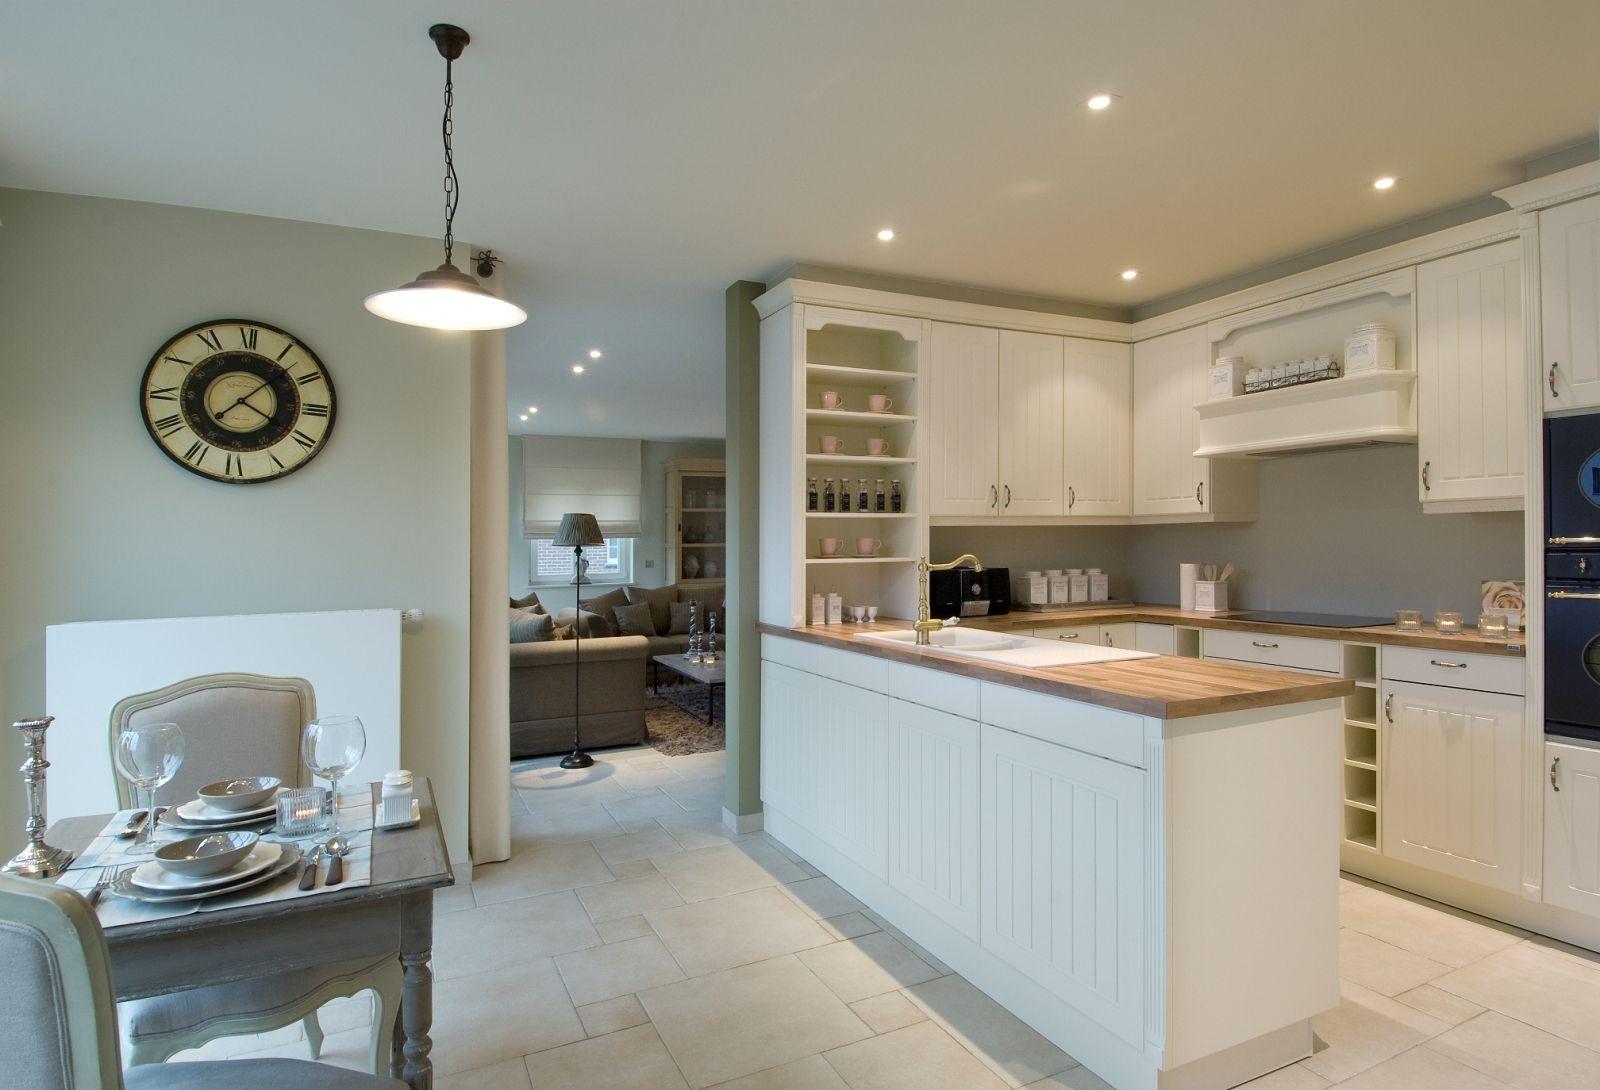 Fabulous keuken with leuke keuken ideeen for Woonkamer intekenen